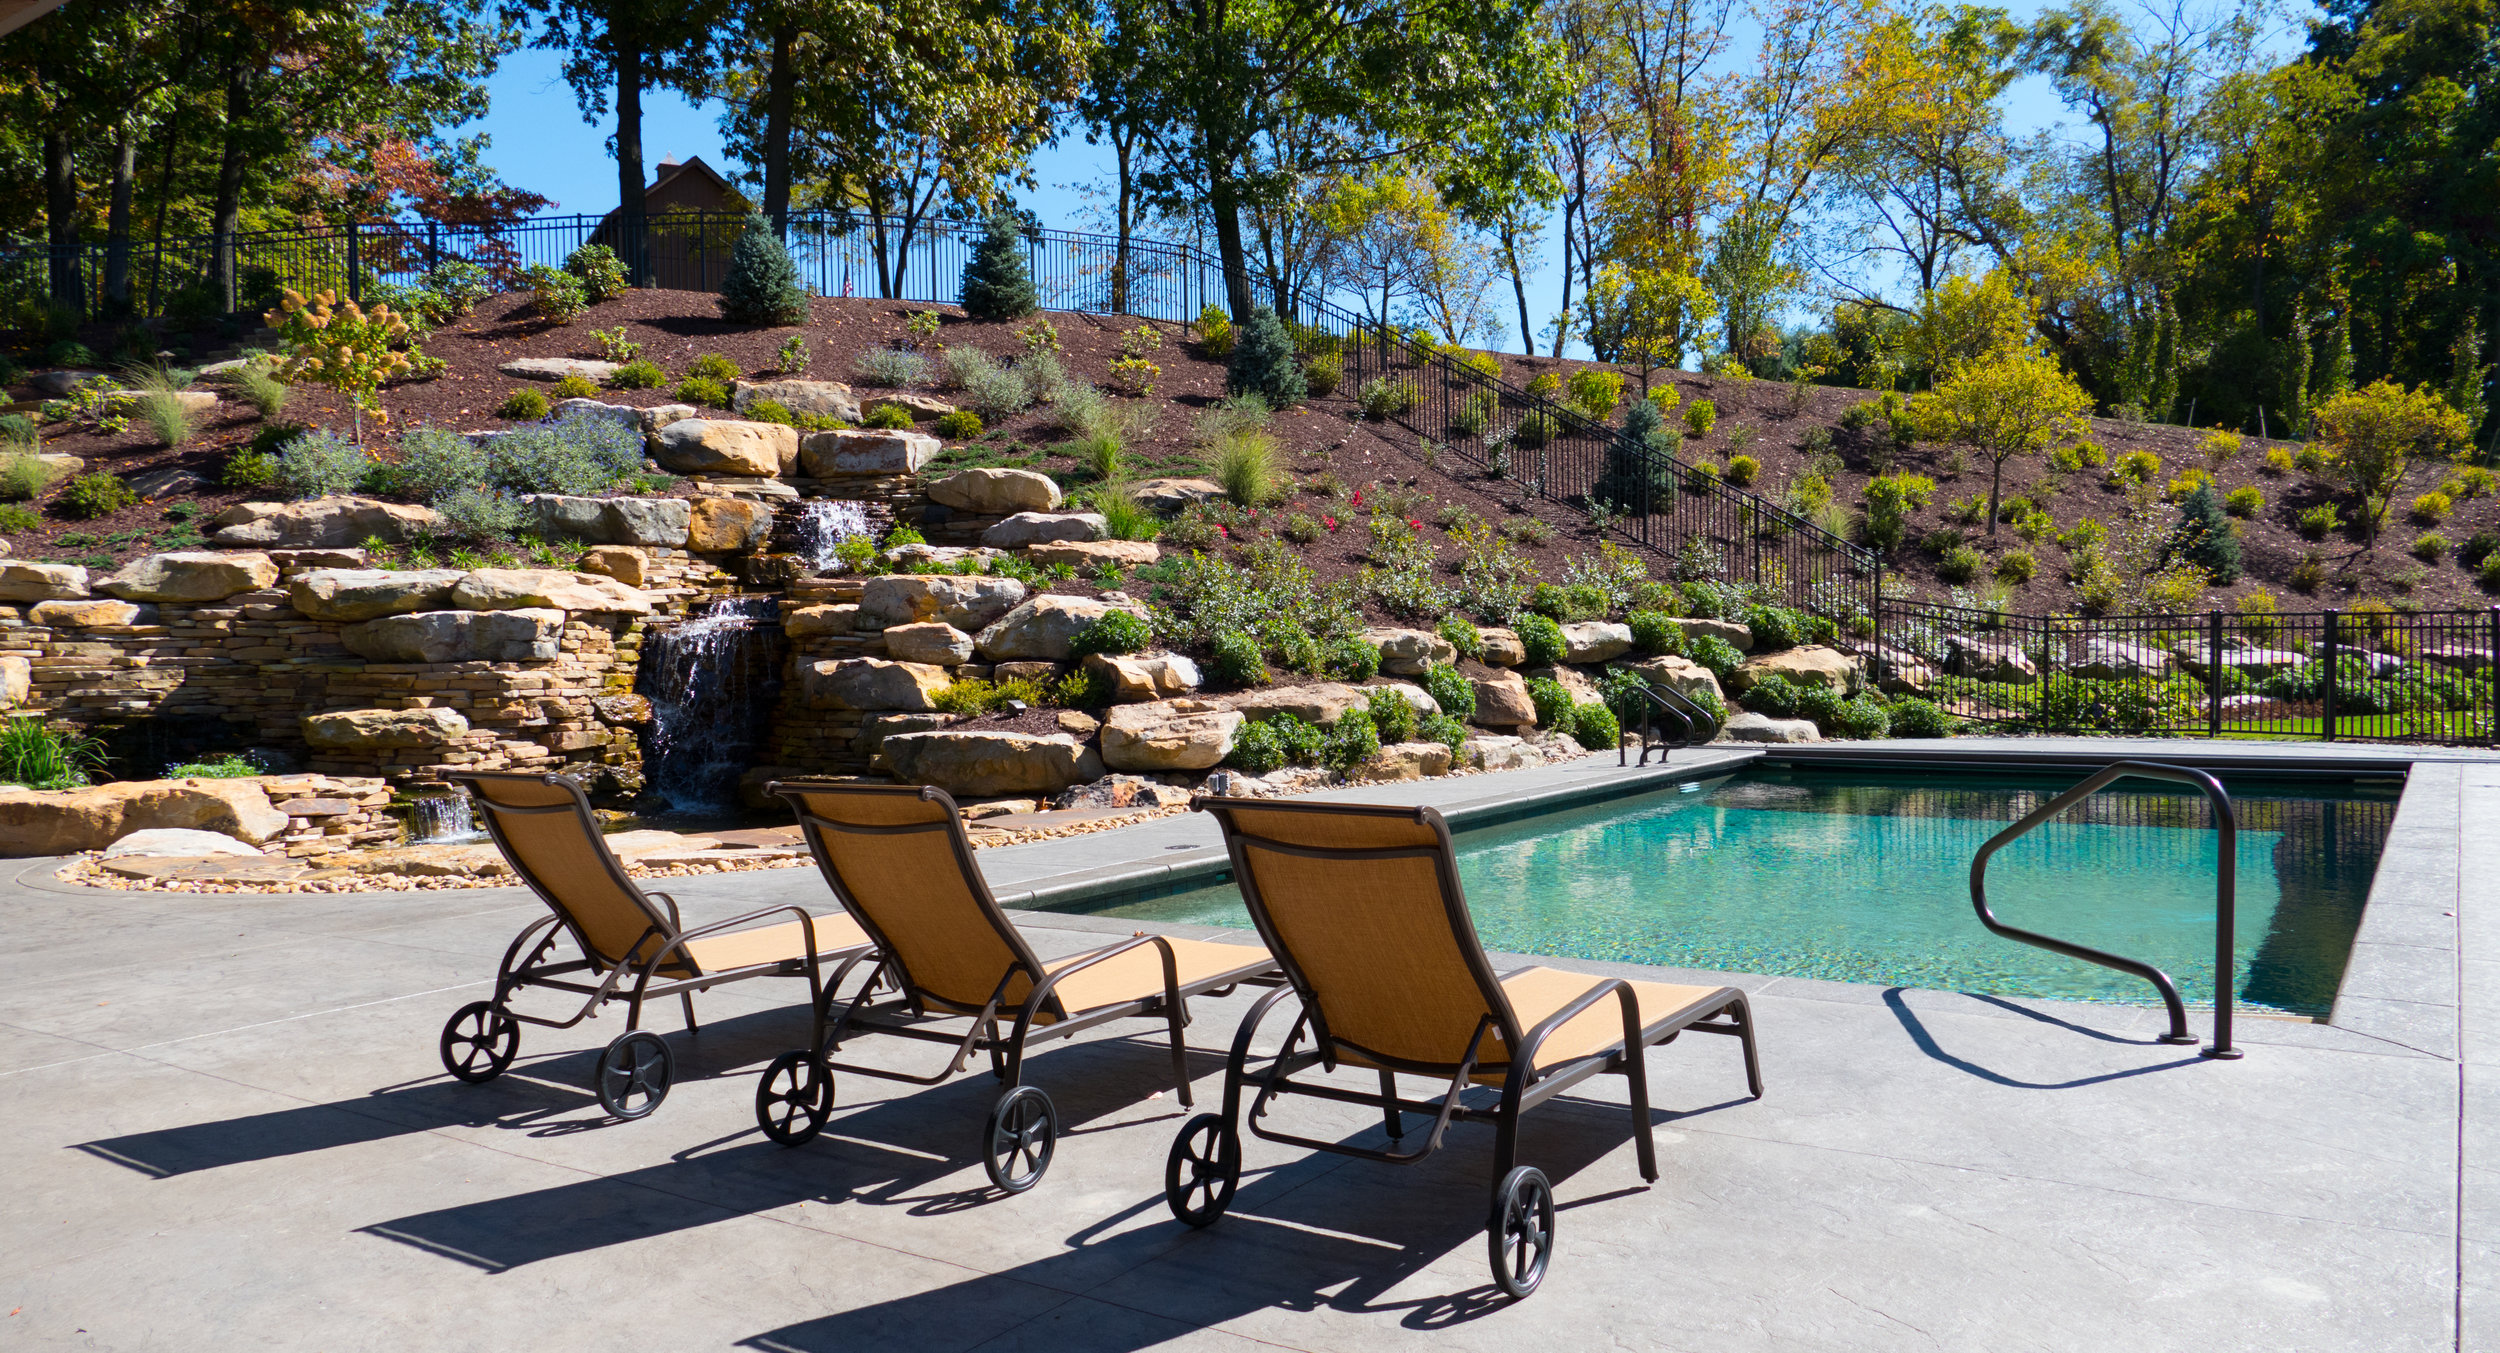 butler, PA landscape design and construction